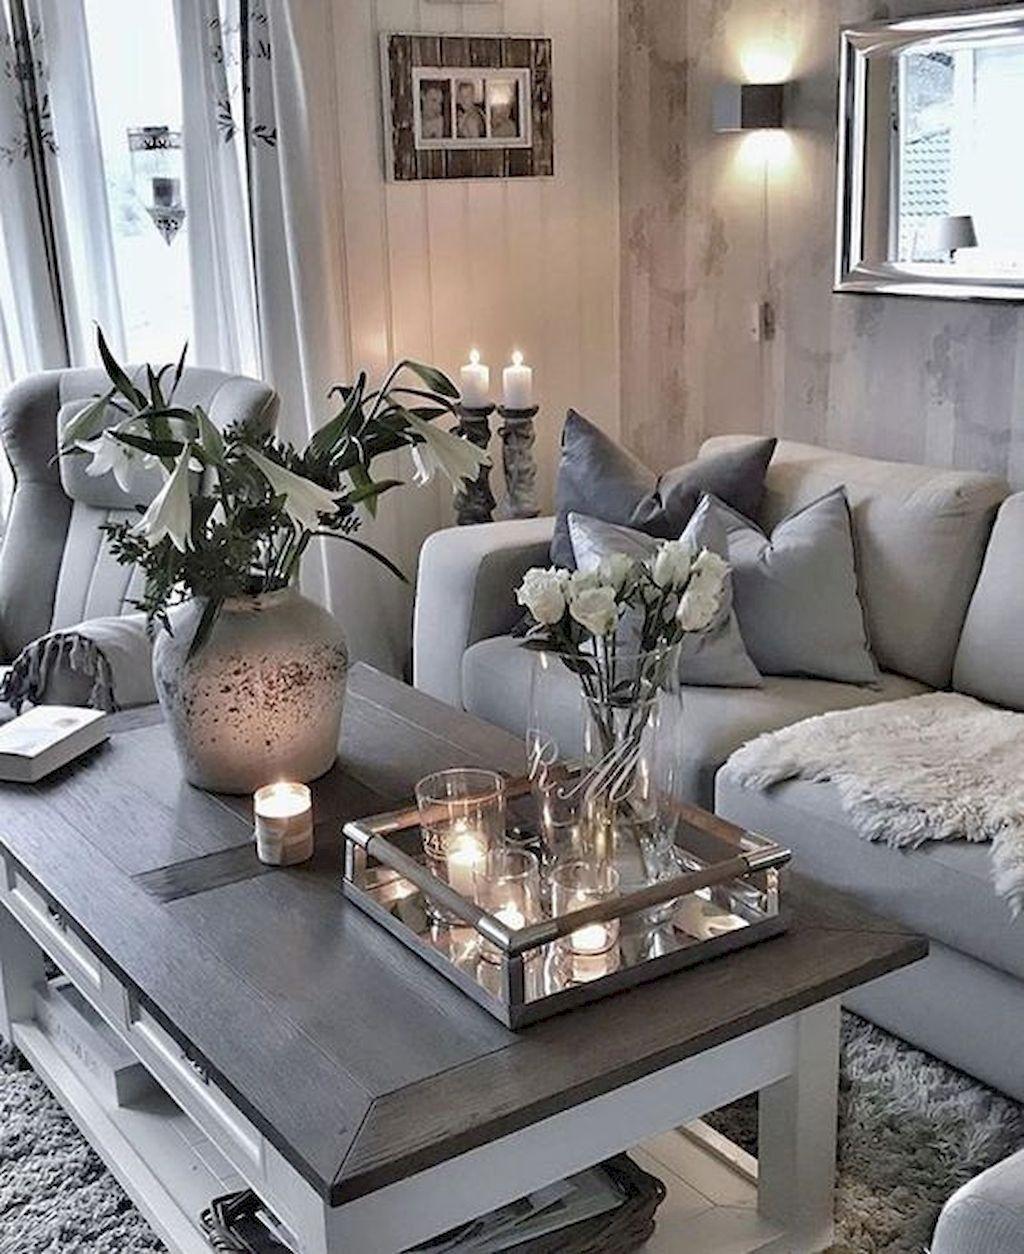 89 Amazing Farmhouse Coffee Table Ideas Living Room Decor Gray Living Room Designs Living Room Inspiration [ 1254 x 1024 Pixel ]